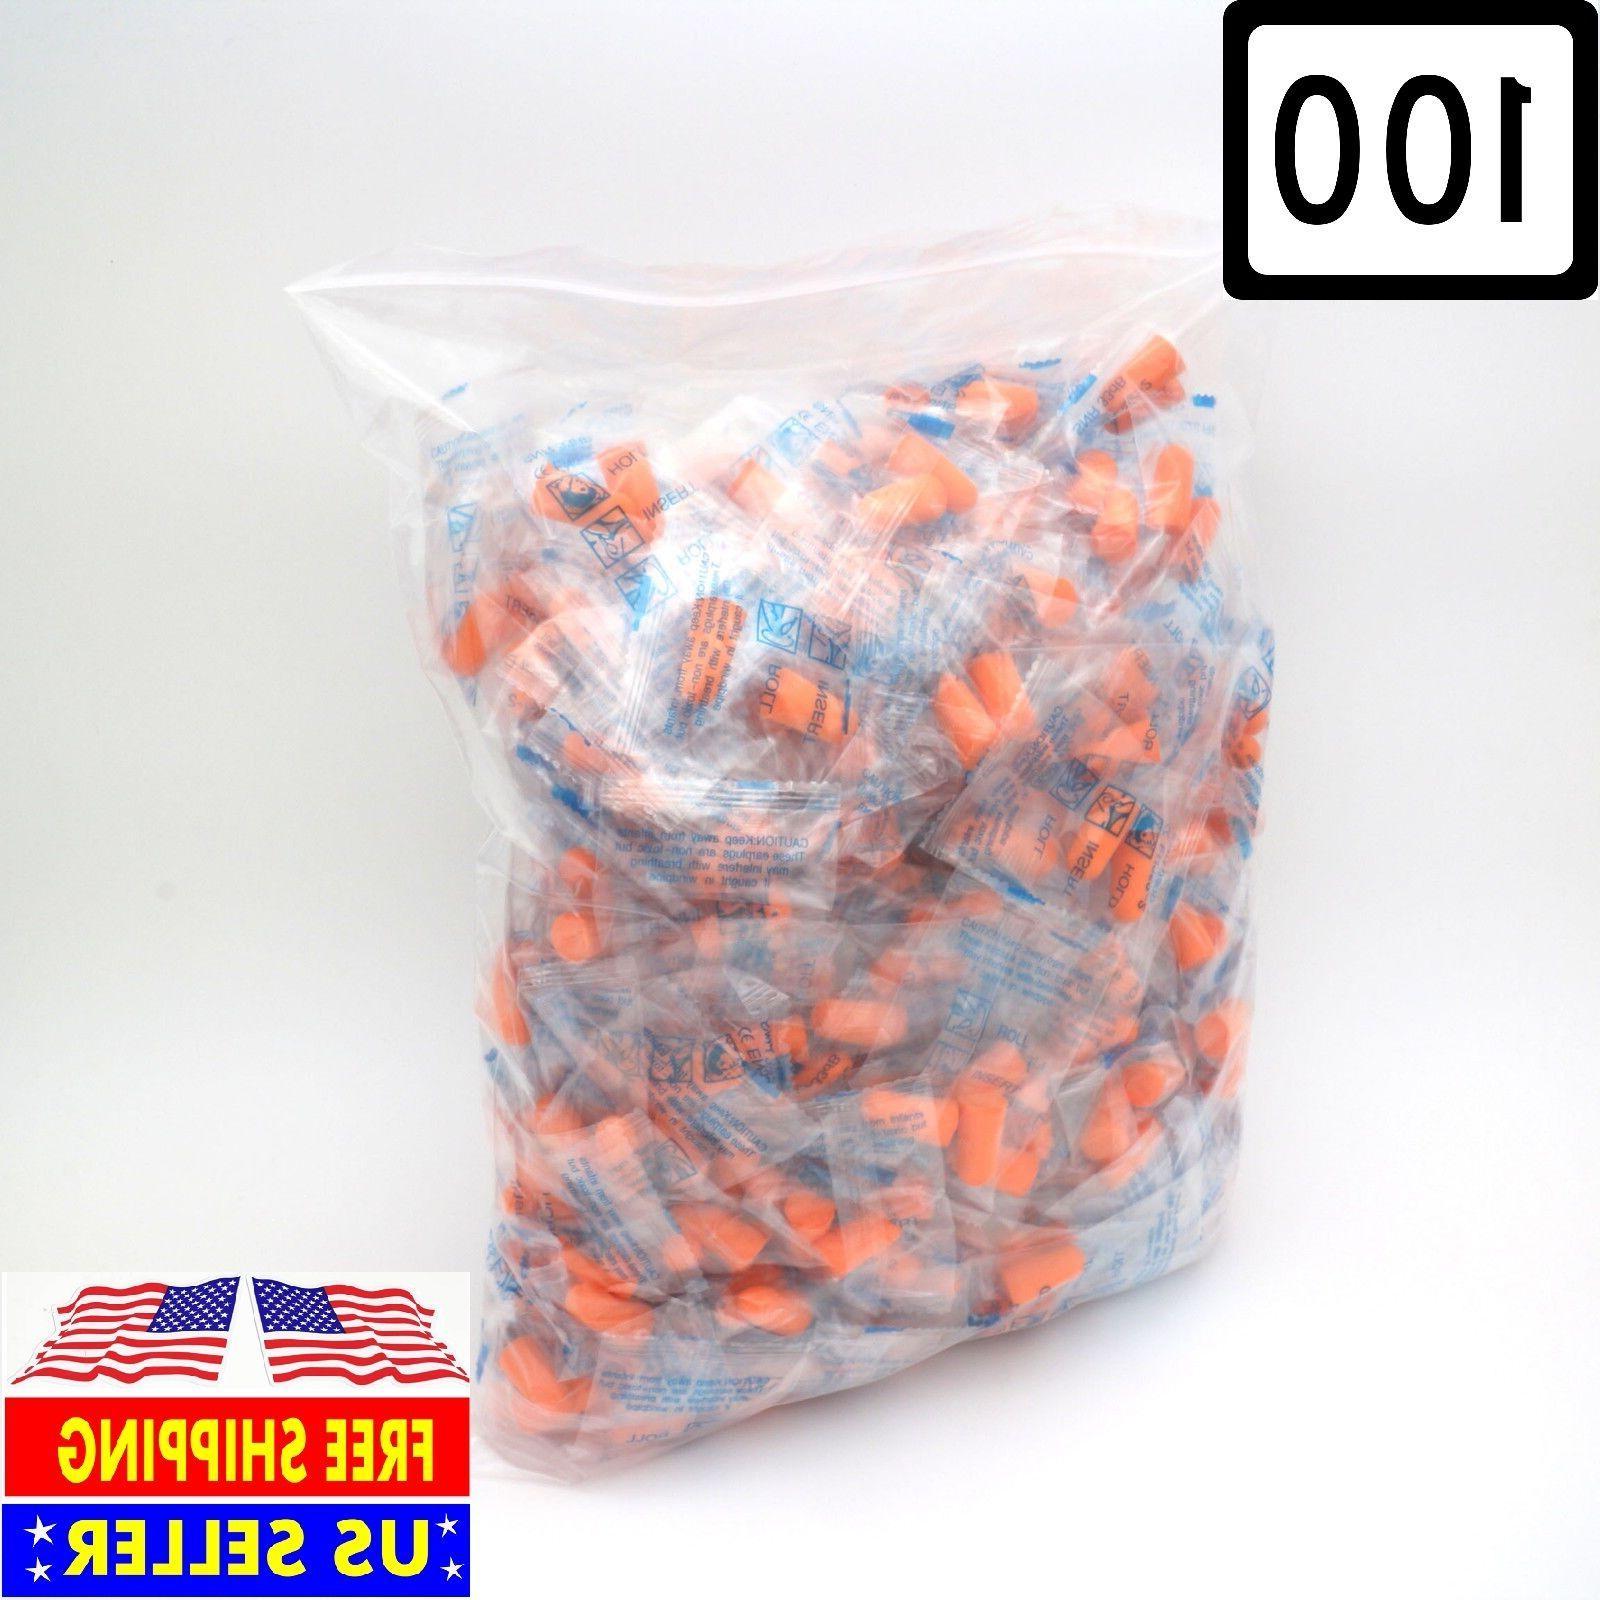 earplugs 100 pair orange soft foam value